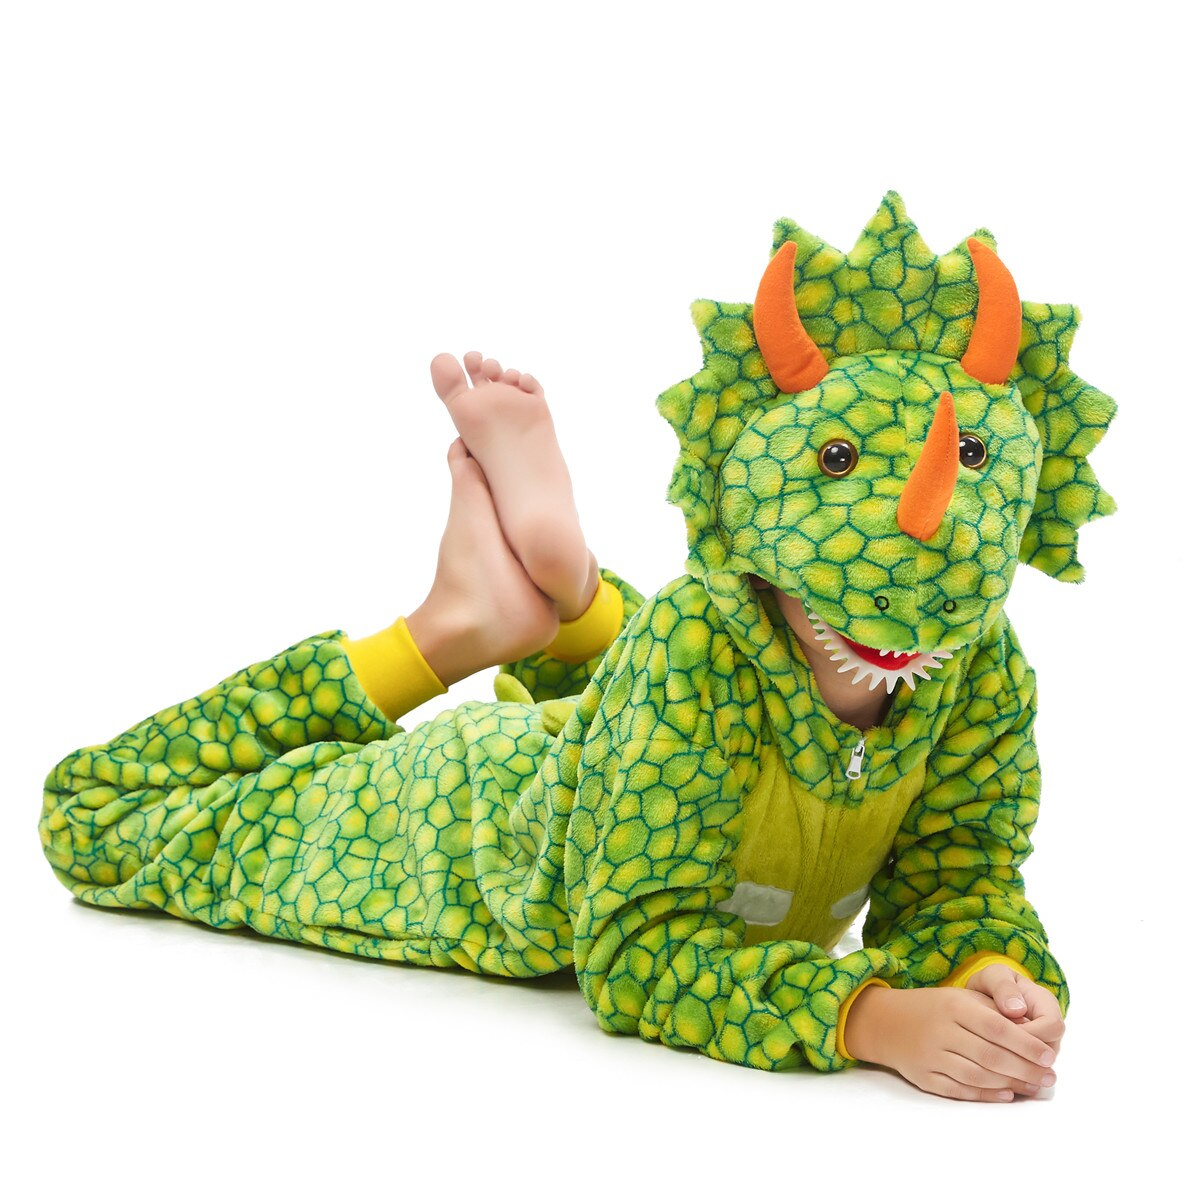 Трицератопс зеленый детский - фото H6e56759f5e1c42c689ea26822cc83fbeX.jpg